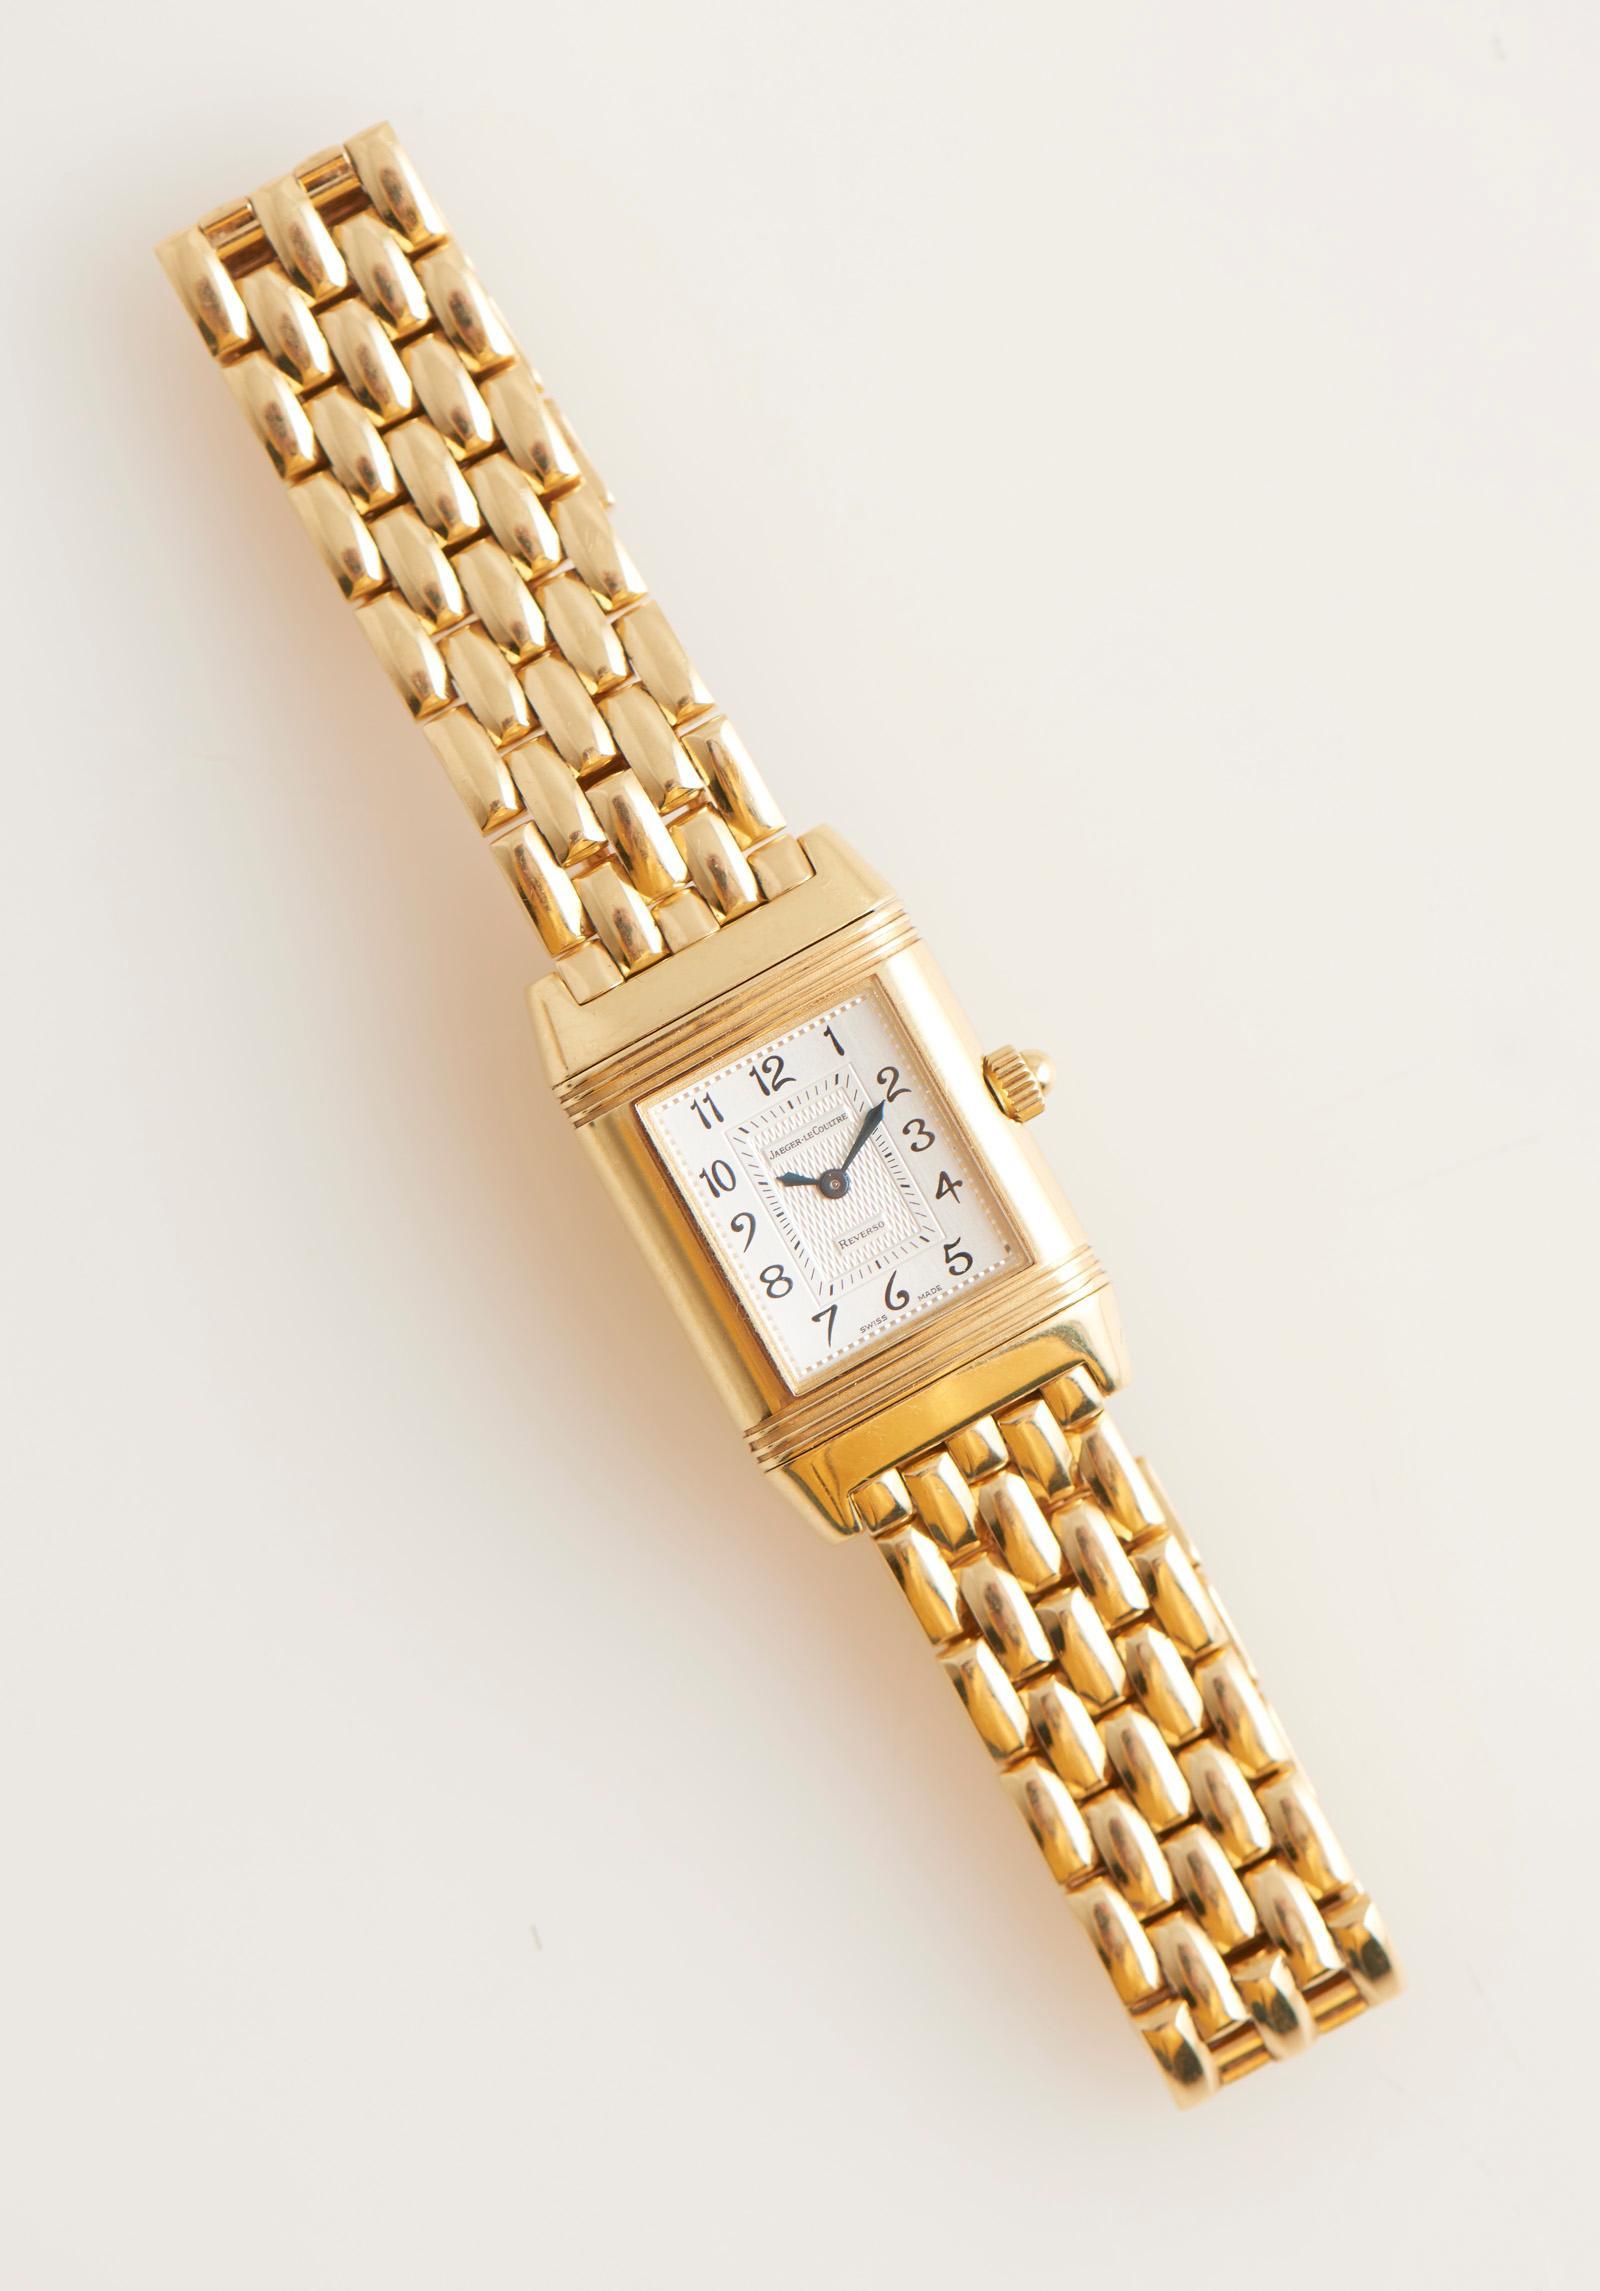 Relógio Jaeger LeCoultre, ouro 750ml, P.99,5g